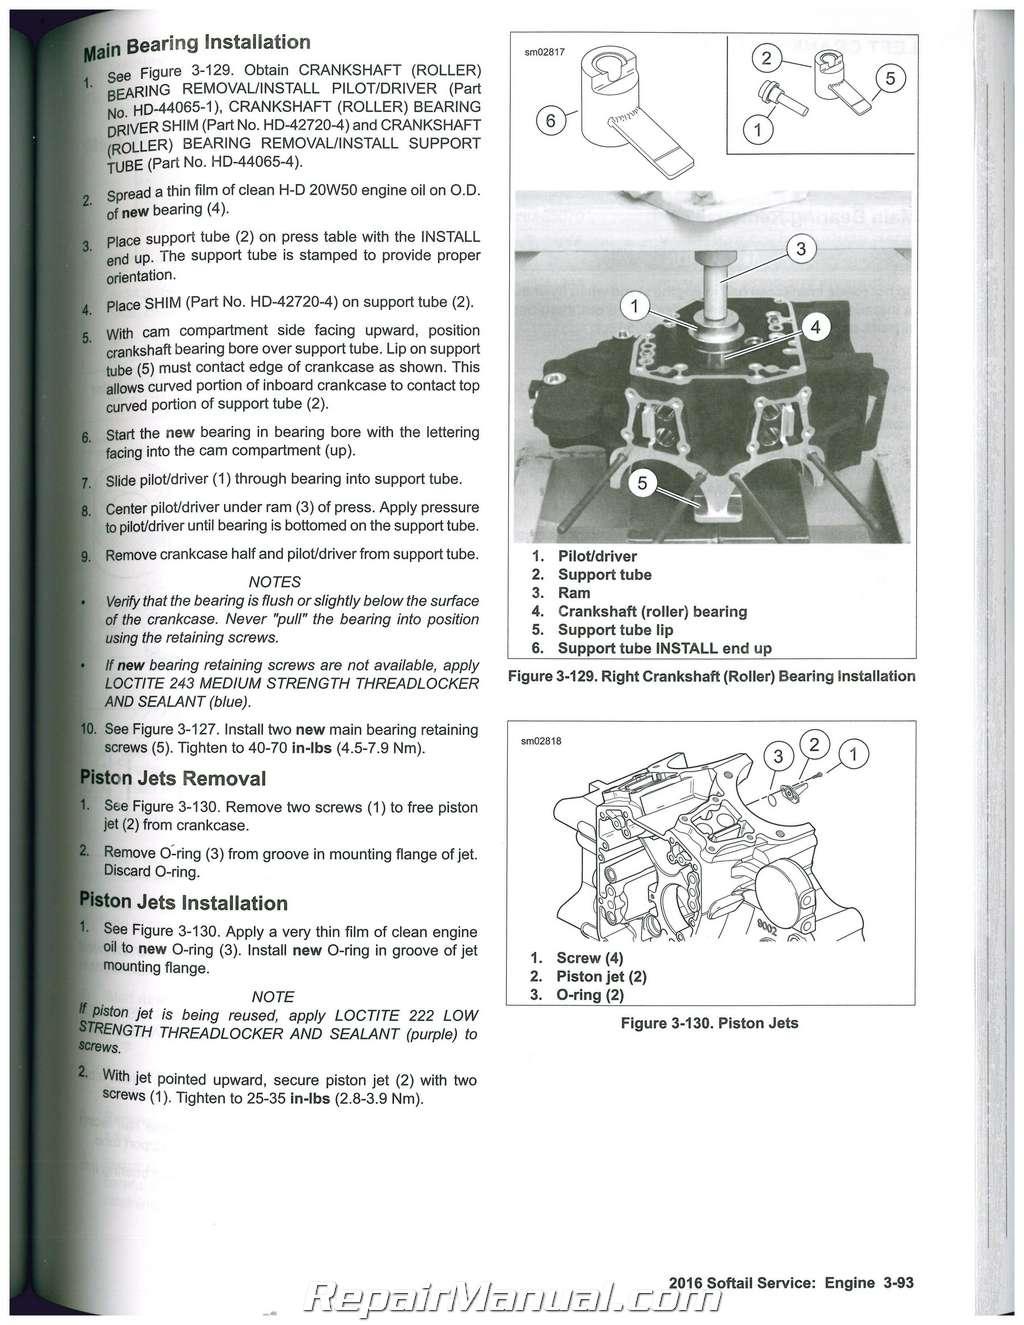 2016 Harley Davidson Softail Motorcycle Service Manual